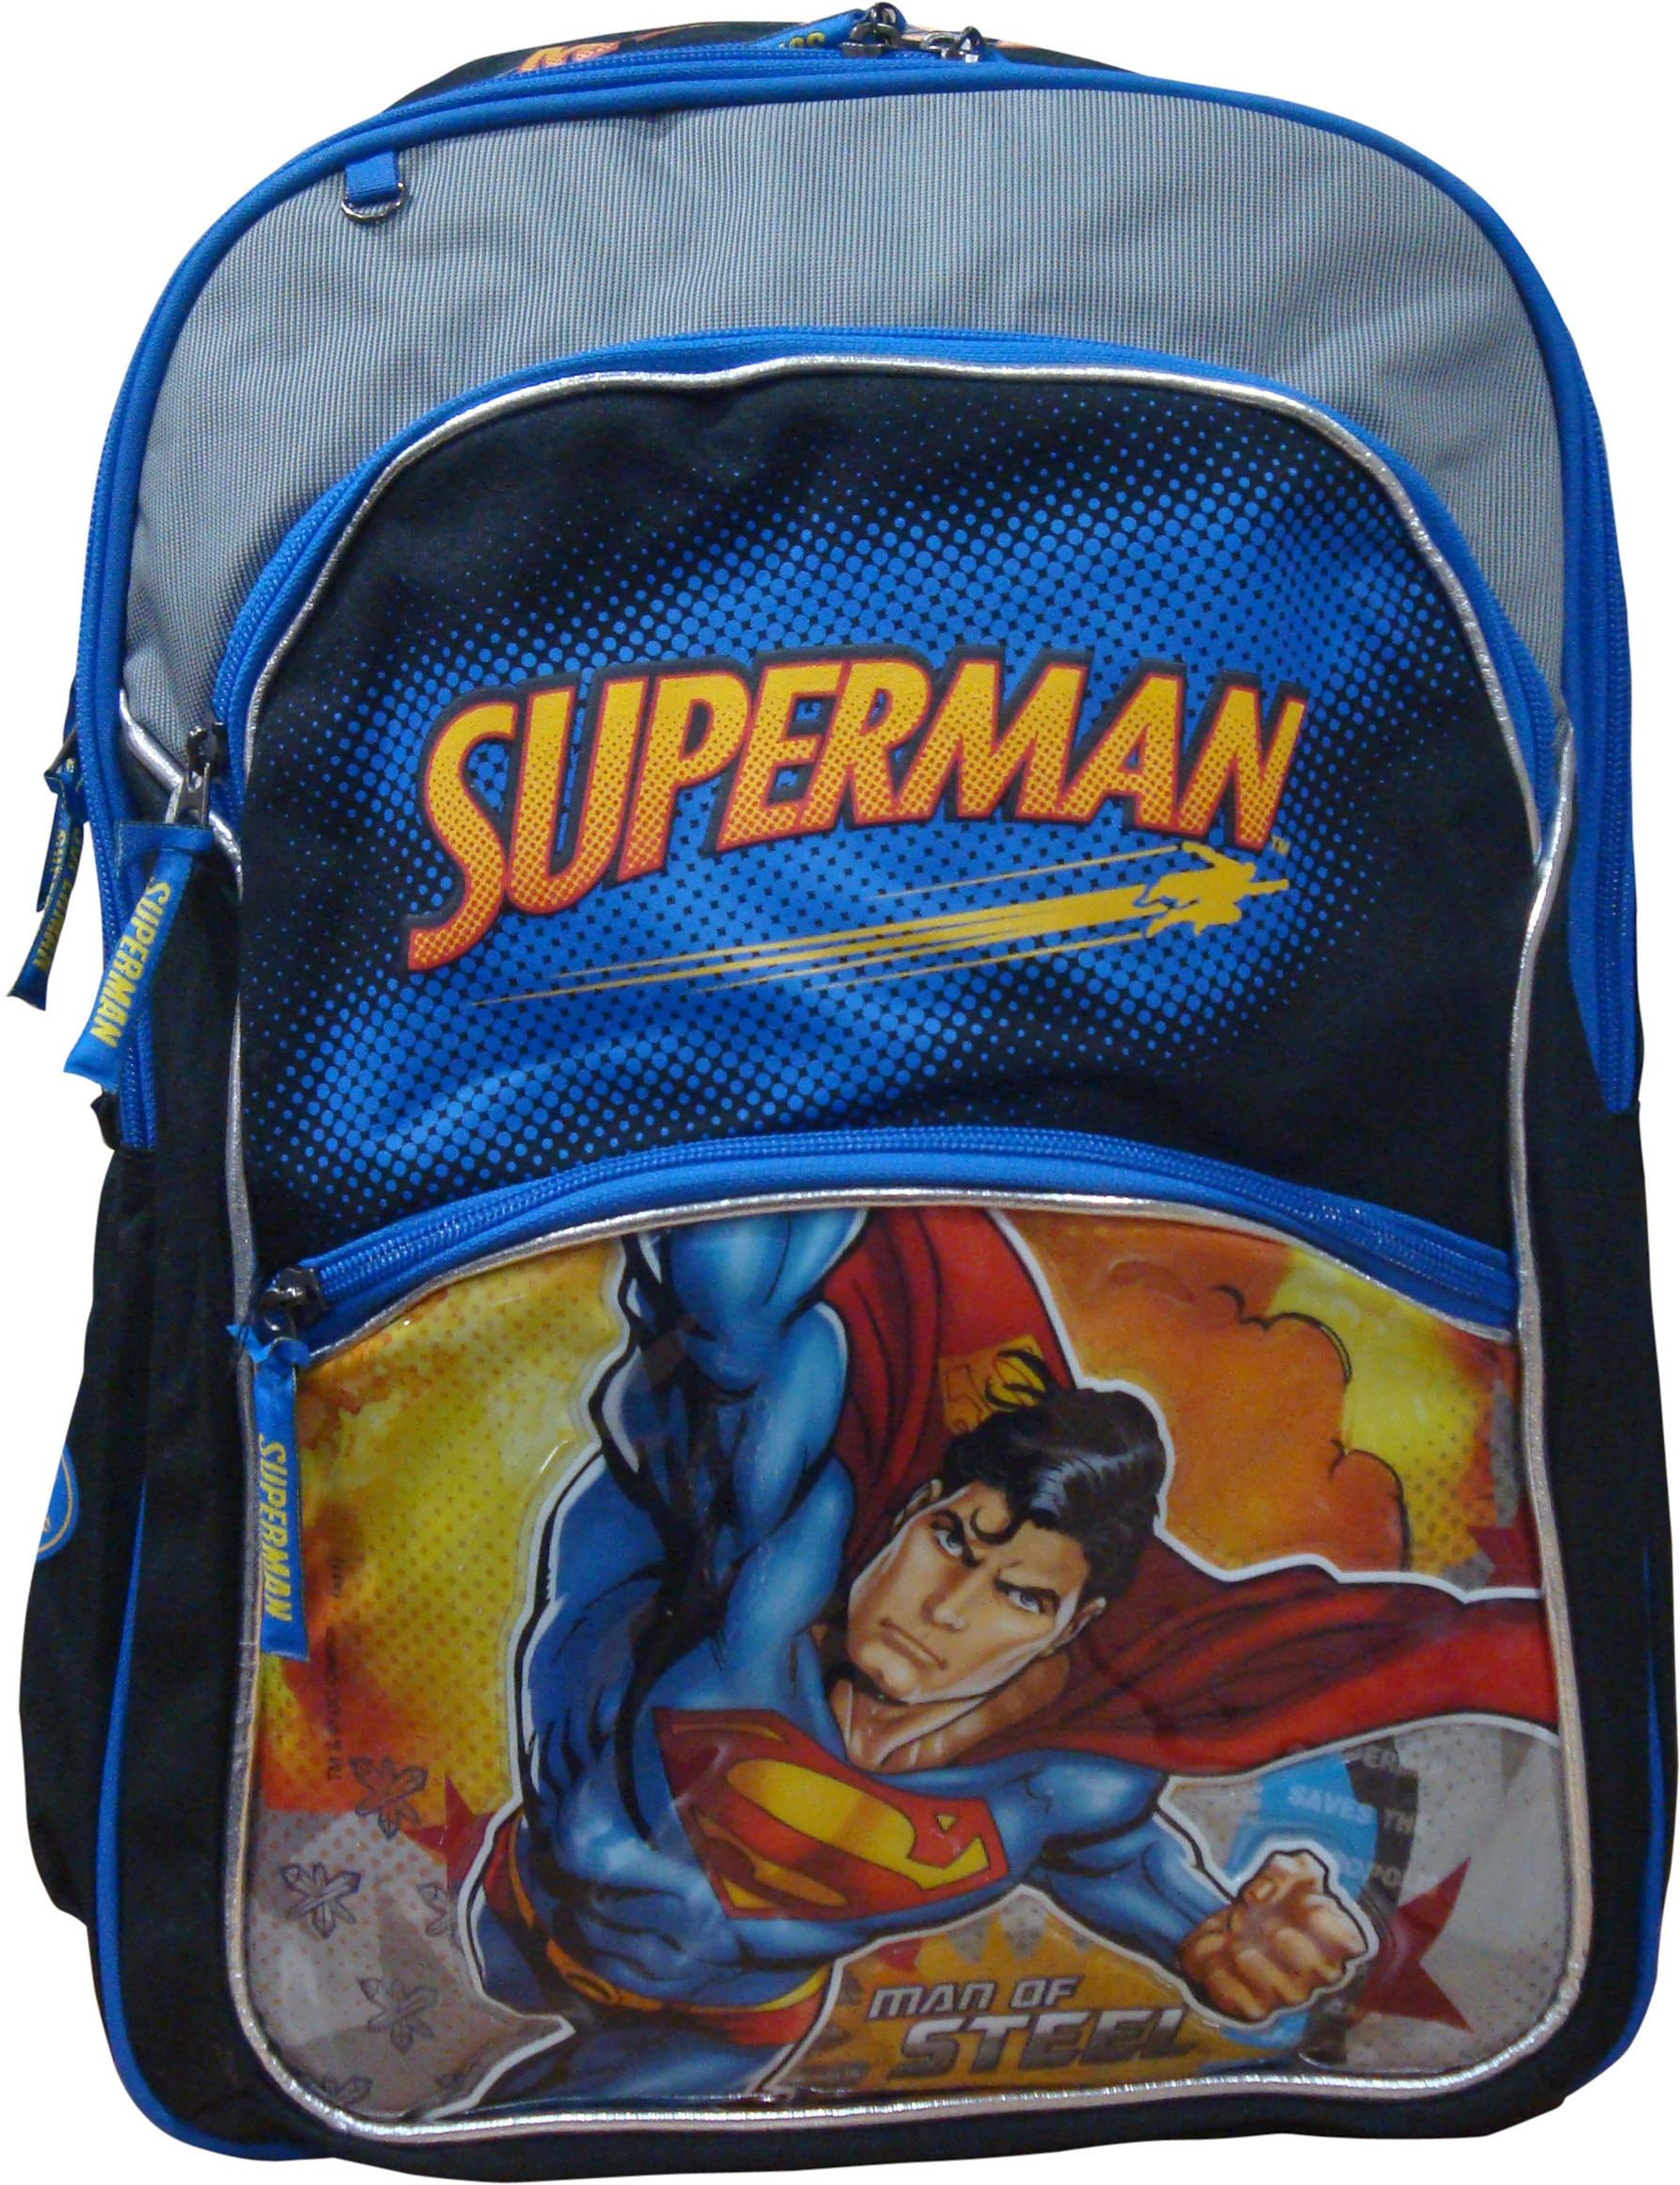 40% OFF on Starx Superman School Bag Waterproof Backpack on Flipkart ... 178b4db4a7ea1